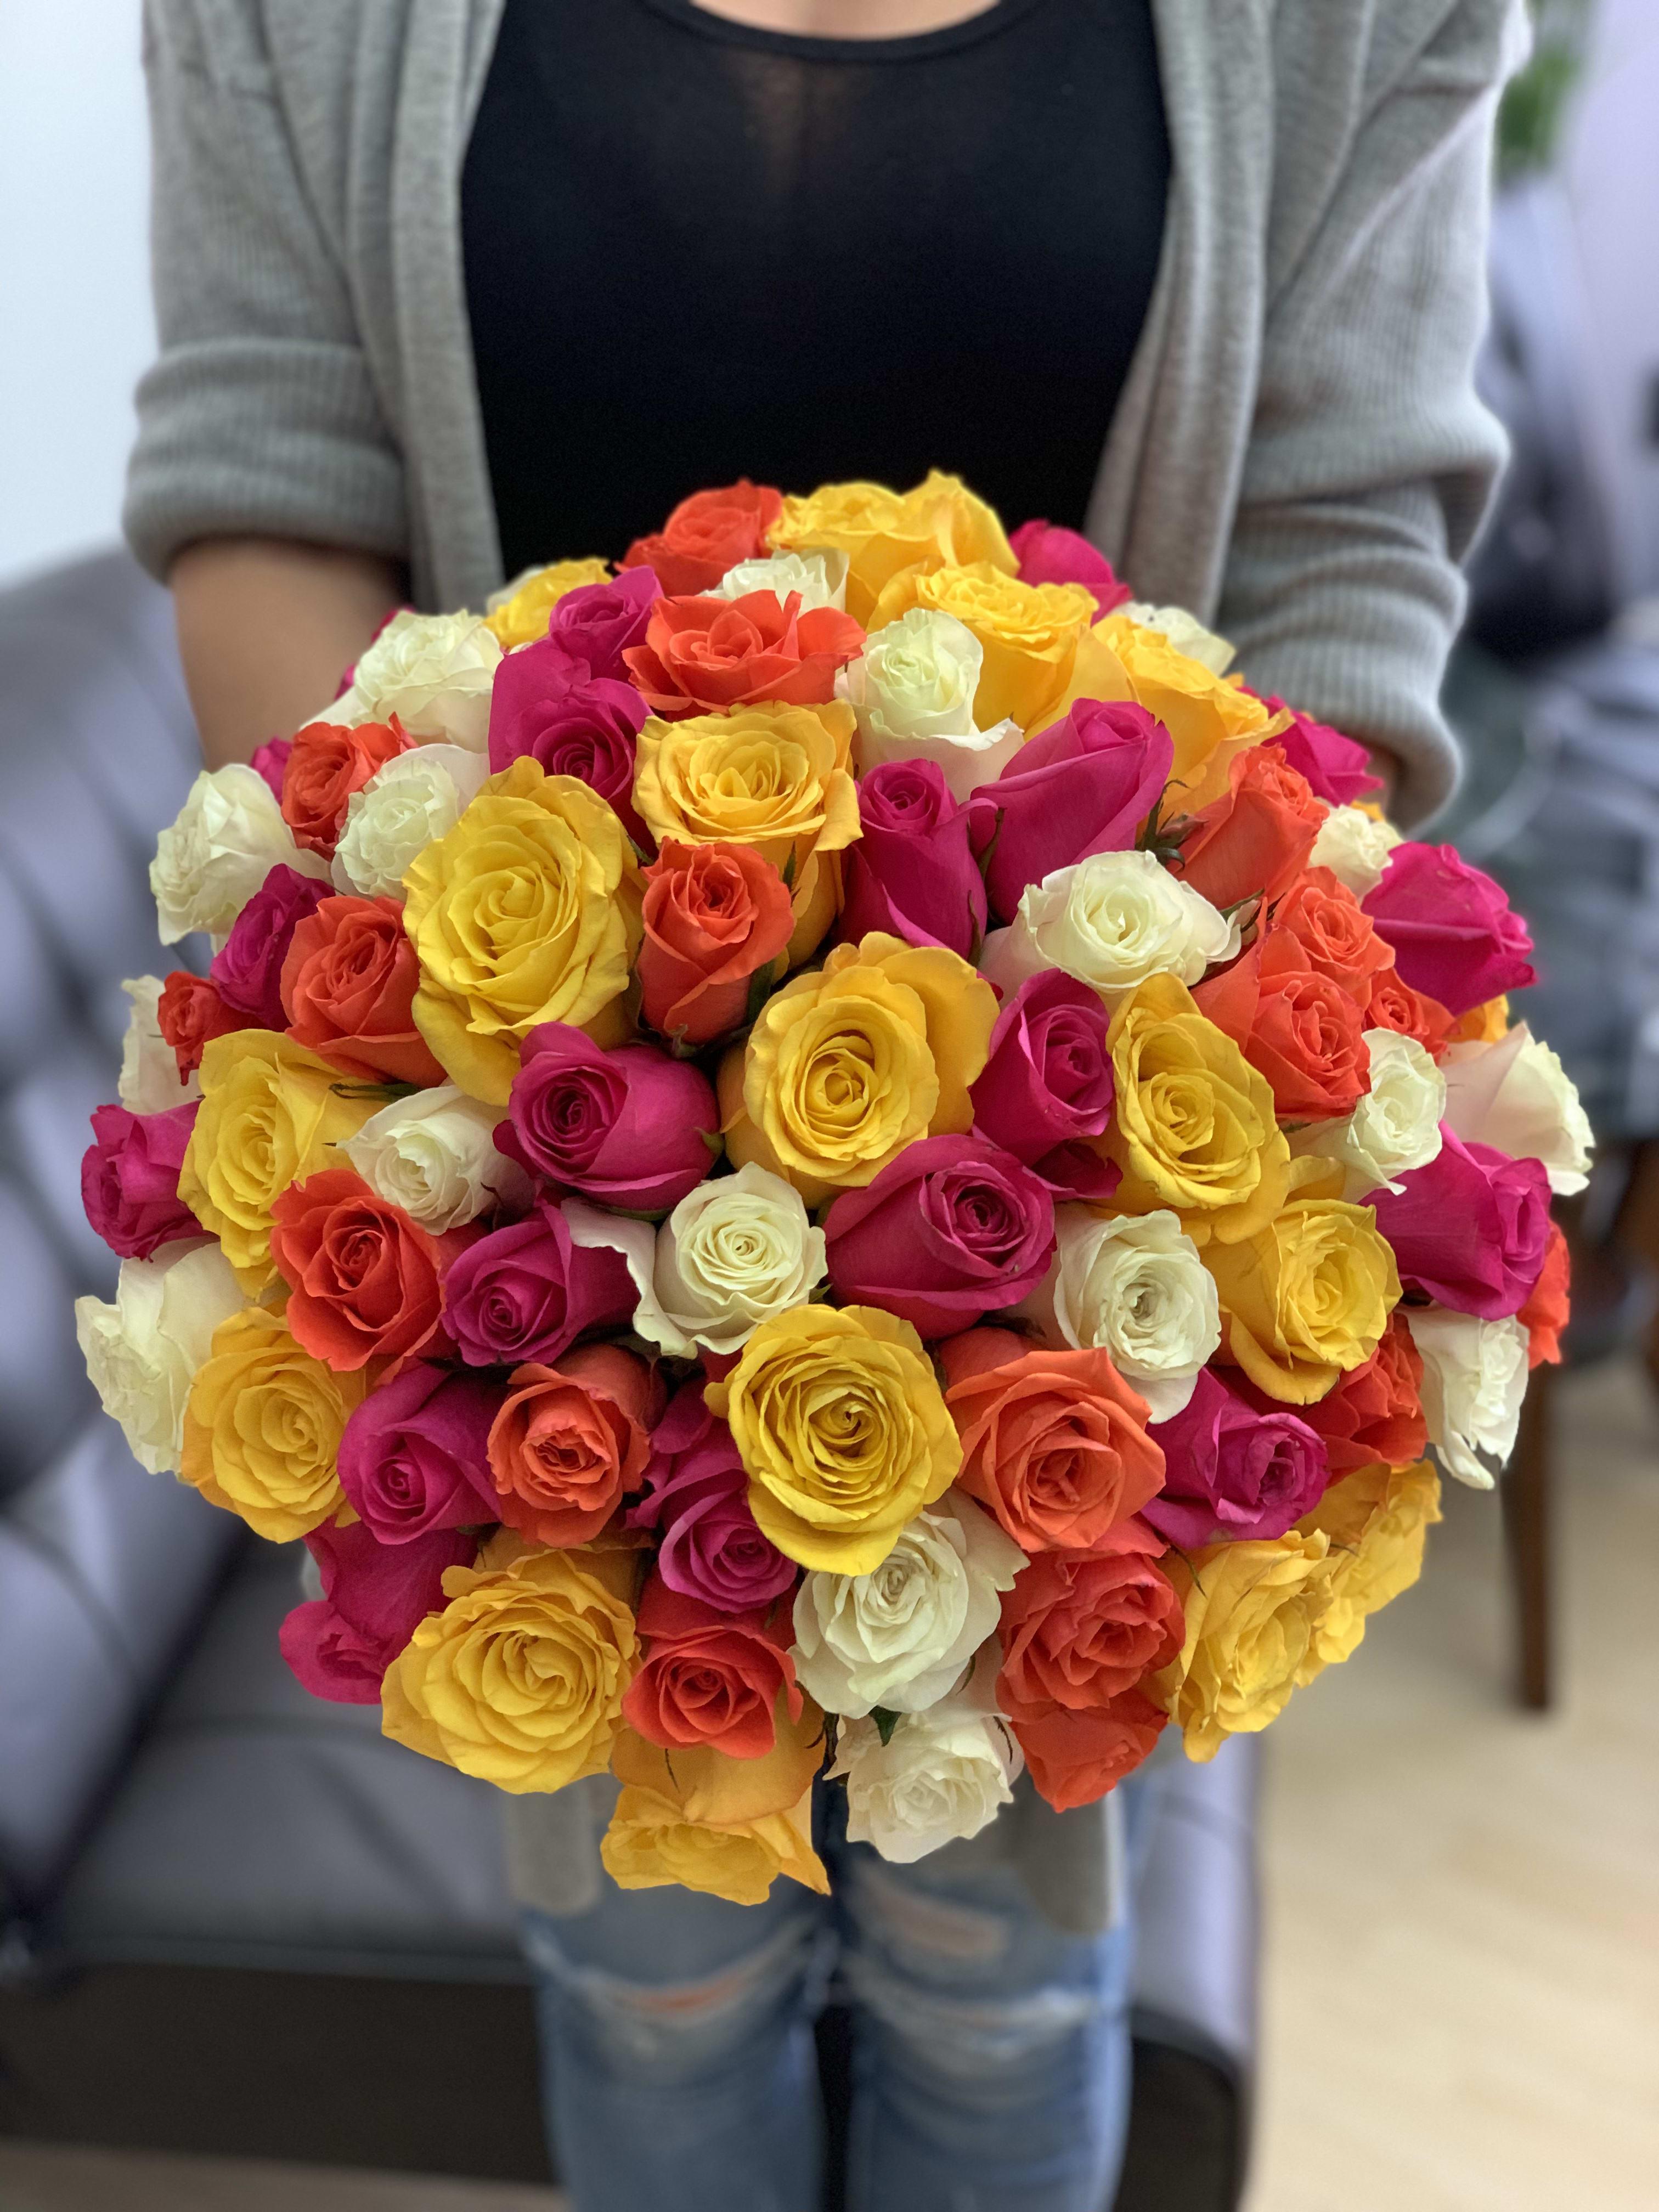 100 Mixed Roses Bouquet in Miami , FL | Luxury Flowers Miami